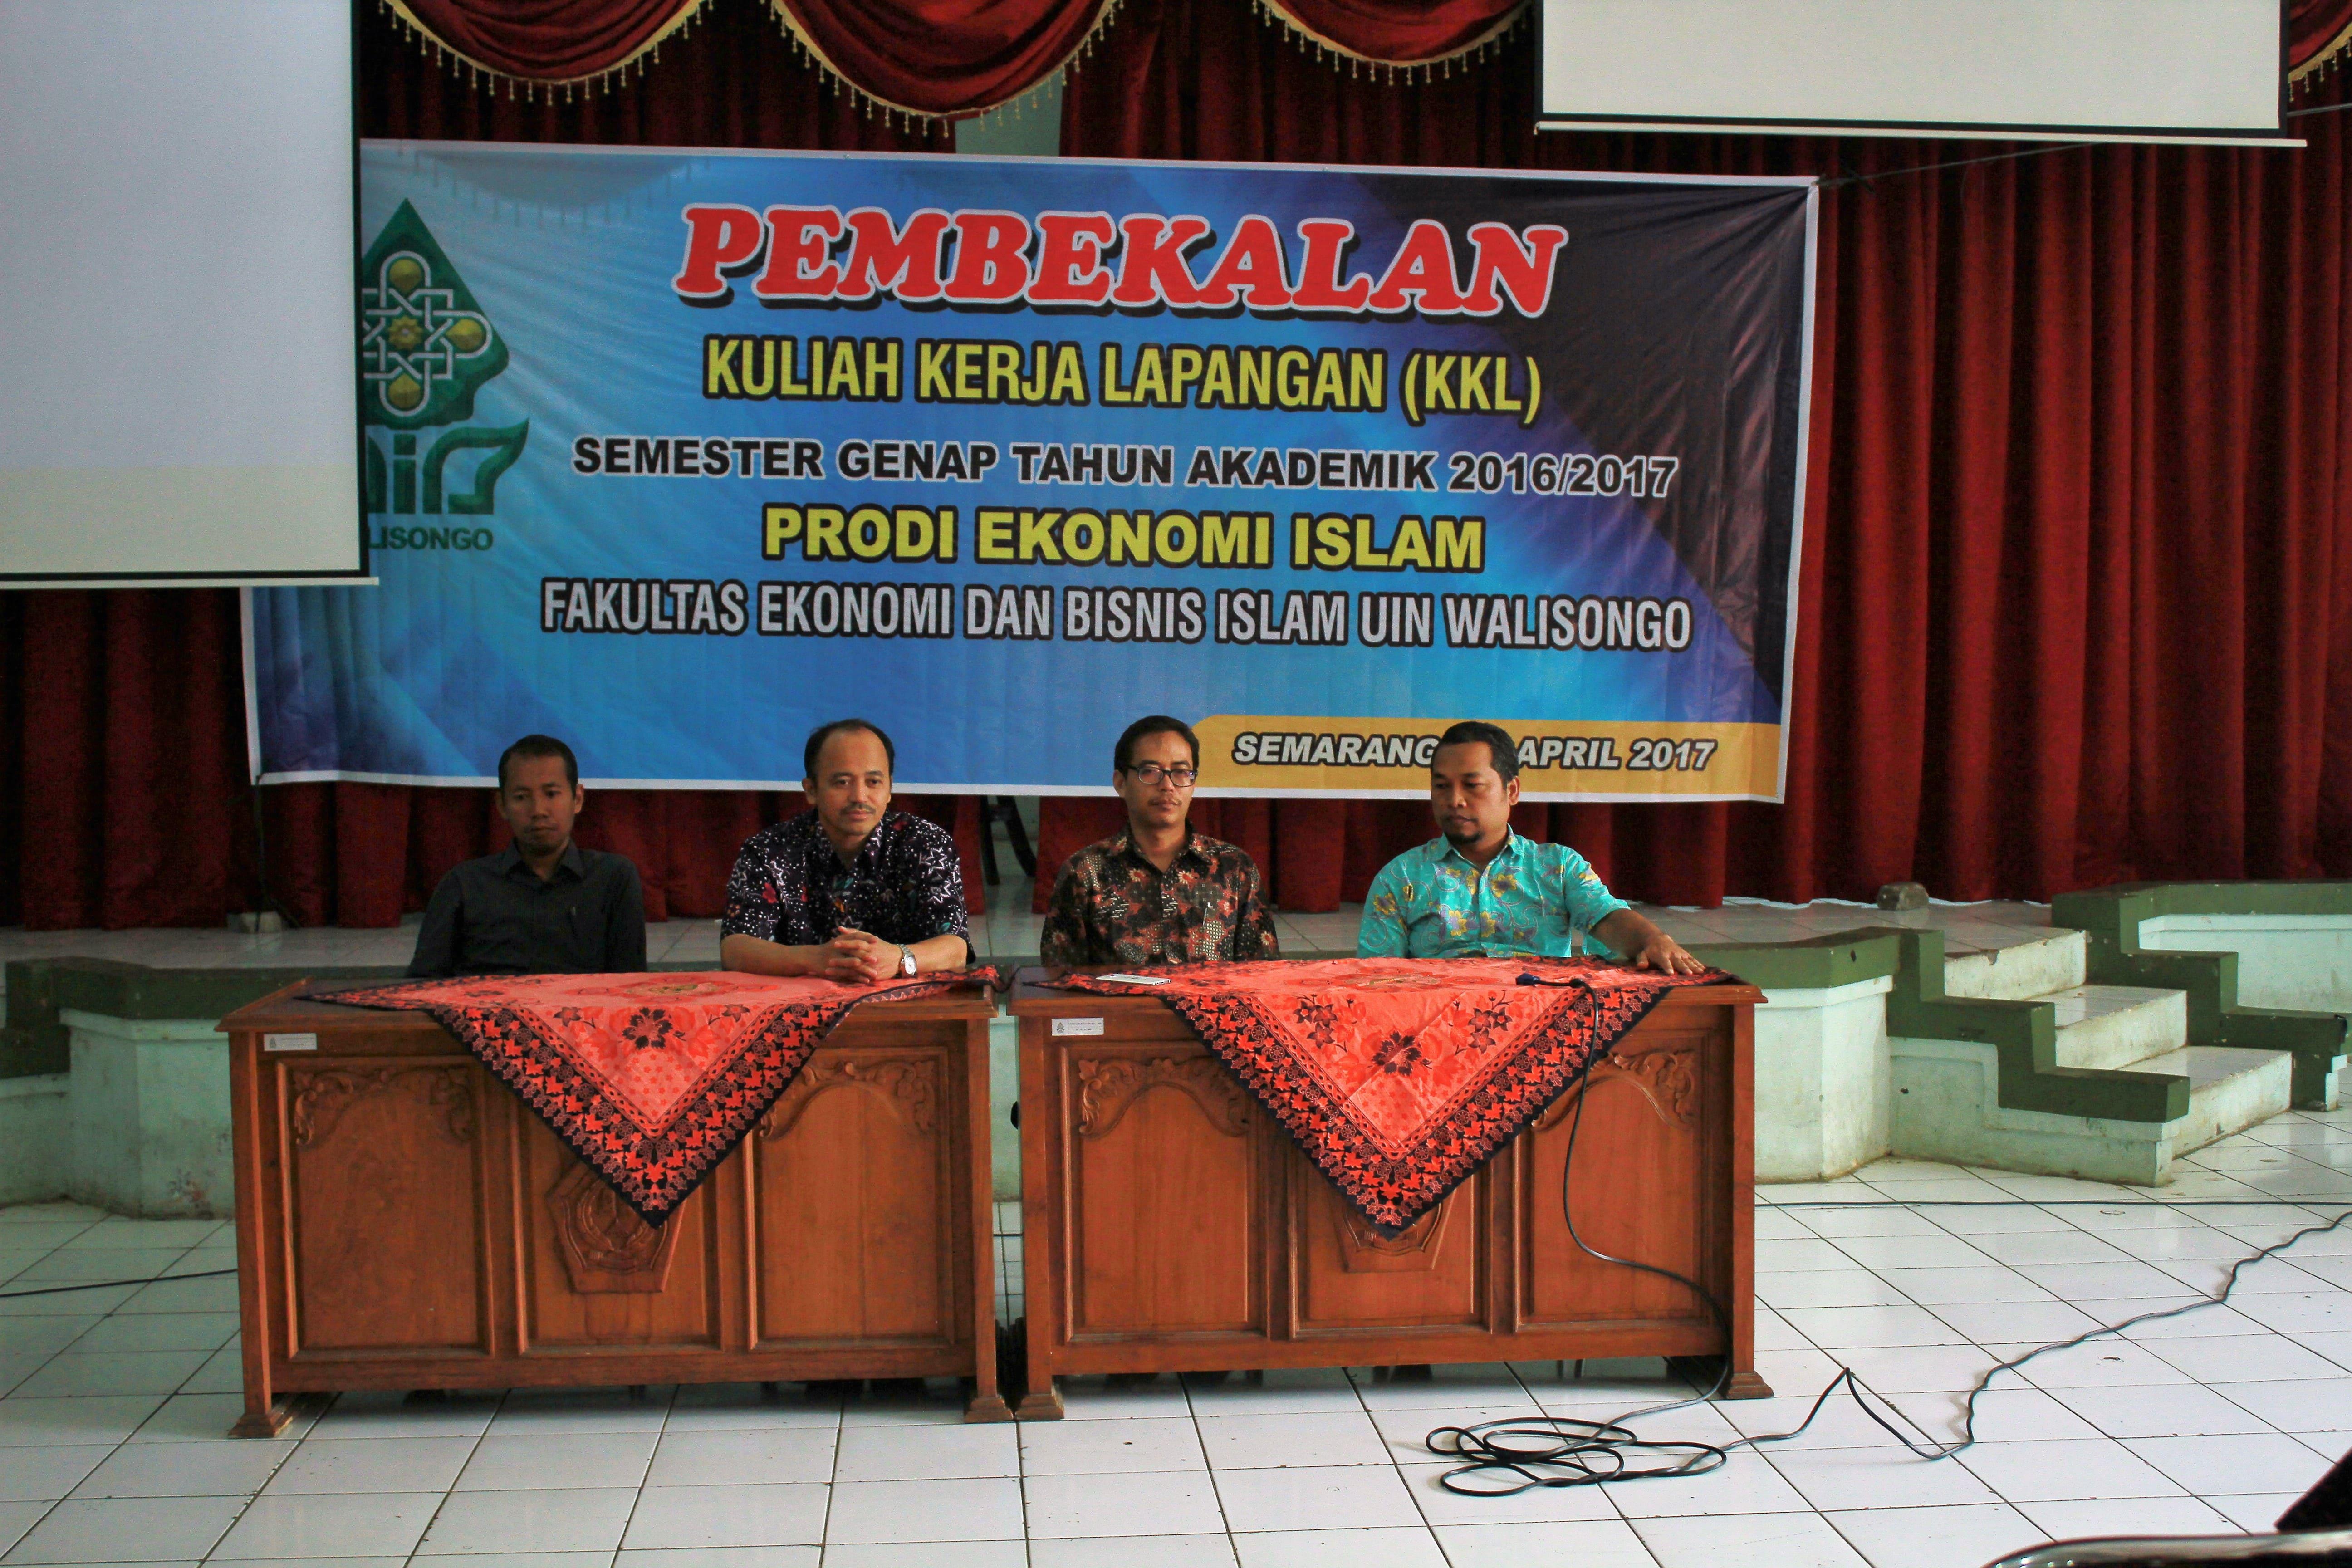 Prodi S1 Ekonomi Islam FEBI UIN Walisongo  Menyelenggarakan Kegiatan  Pembekalan KKL